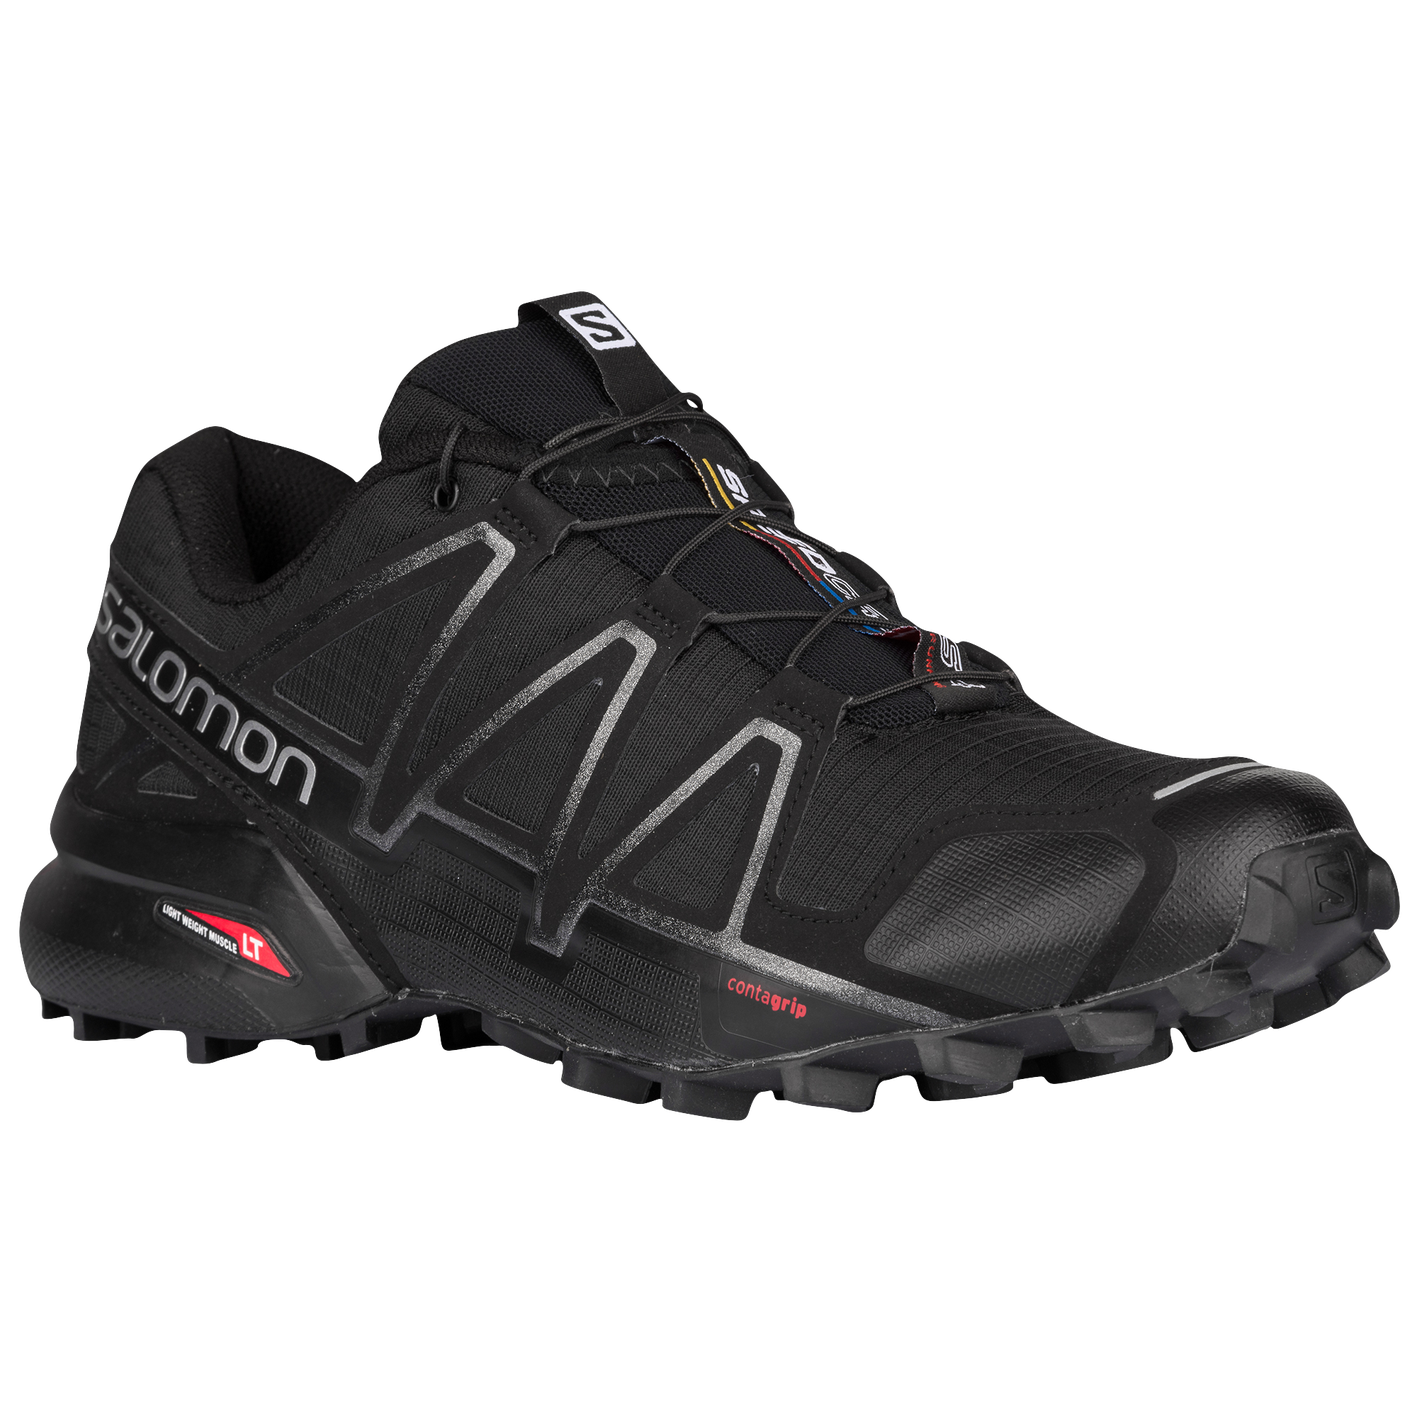 3421eec1ea12 Salomon Speedcross 4 - Men s.  99.99 -  130.00. Product    383130. Selected  Style  Black Black Metallic ...